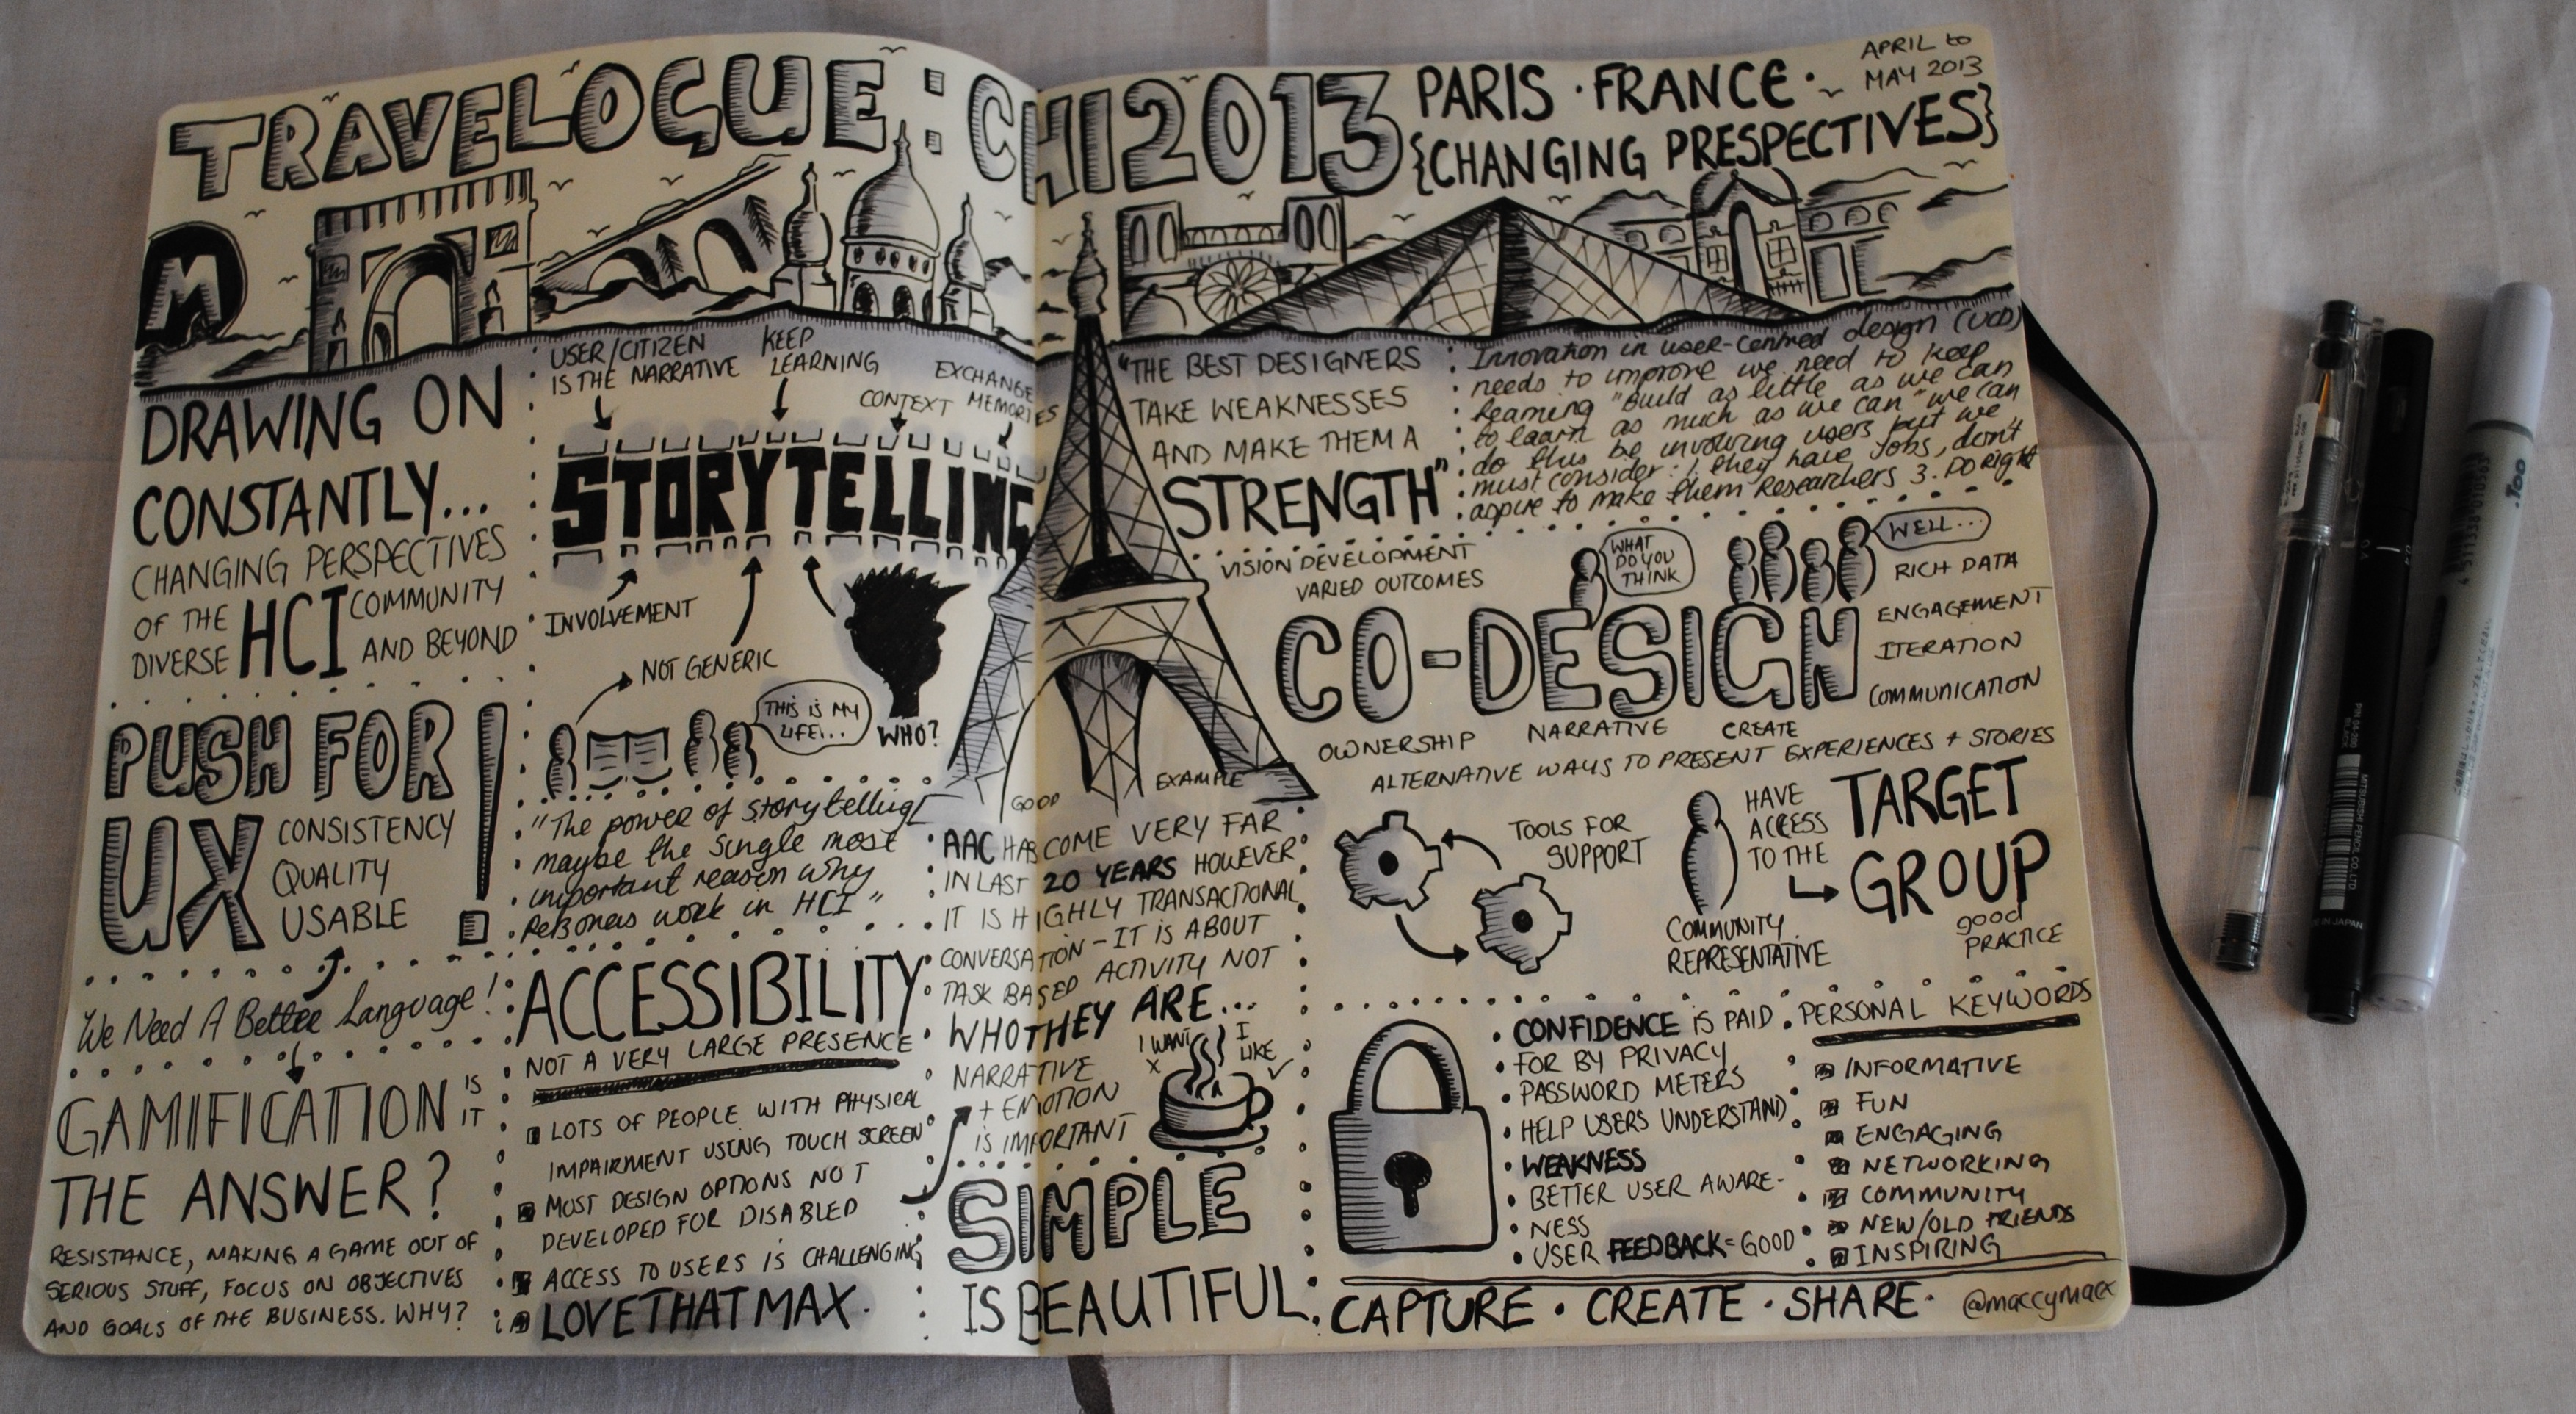 How to write a travelogue?